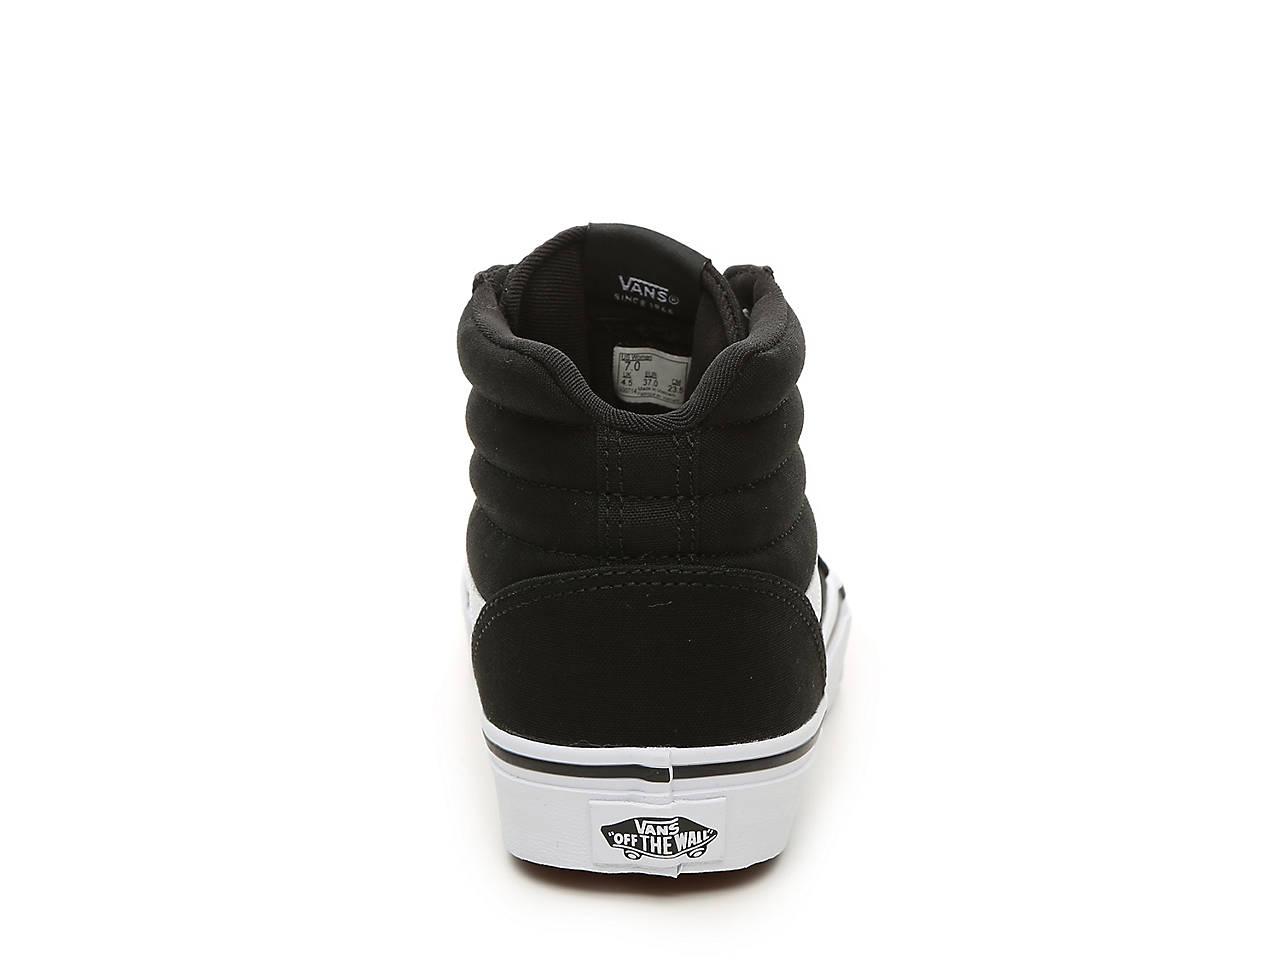 401f58f71e9ade Vans Ward High-Top Sneaker - Women s Women s Shoes